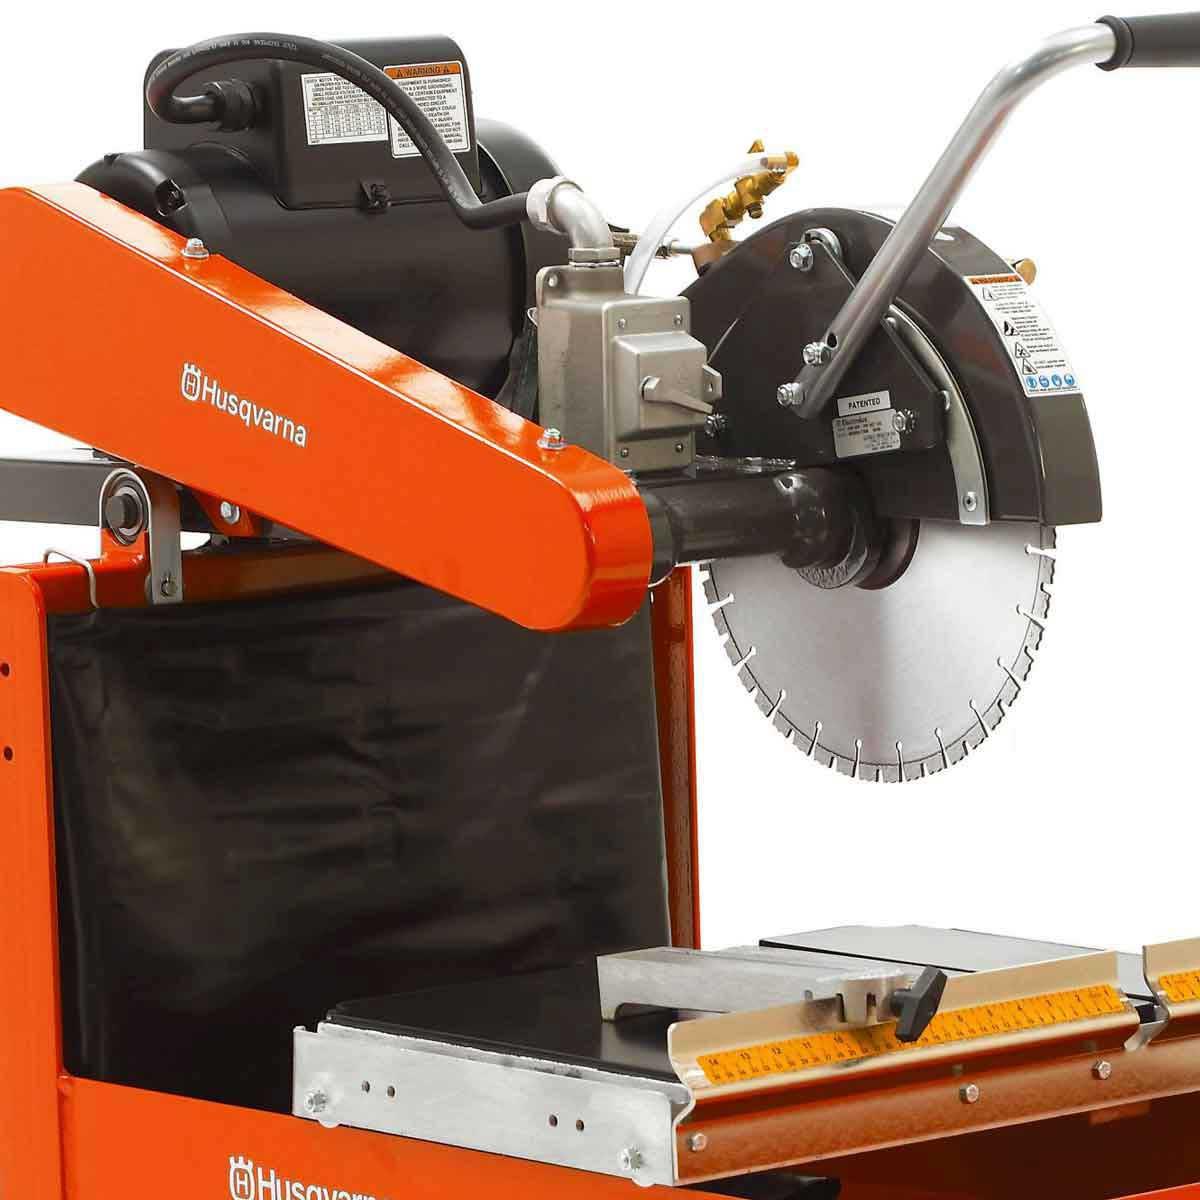 husqvarna ms 510 electric block saw